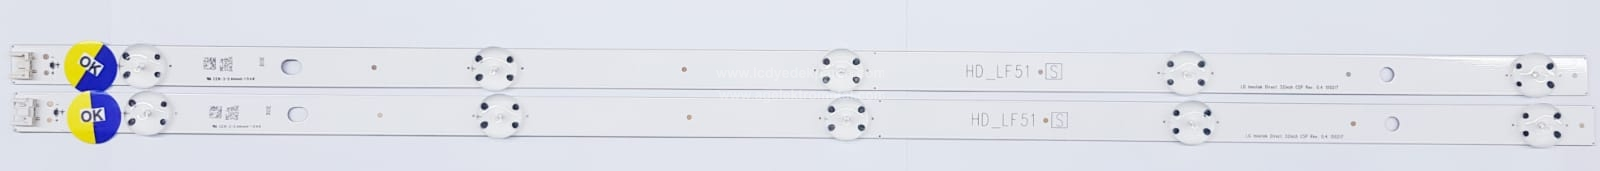 LG INNOTEK DIRECT 32INCH CSP REV. 0.4 , REV0.5 , 150217 , HD_LF51 , LG , HC320DXN-ABVS4-5112 , EAJ63771001 ,32LF510 , 2 ADET LED ÇUBUK